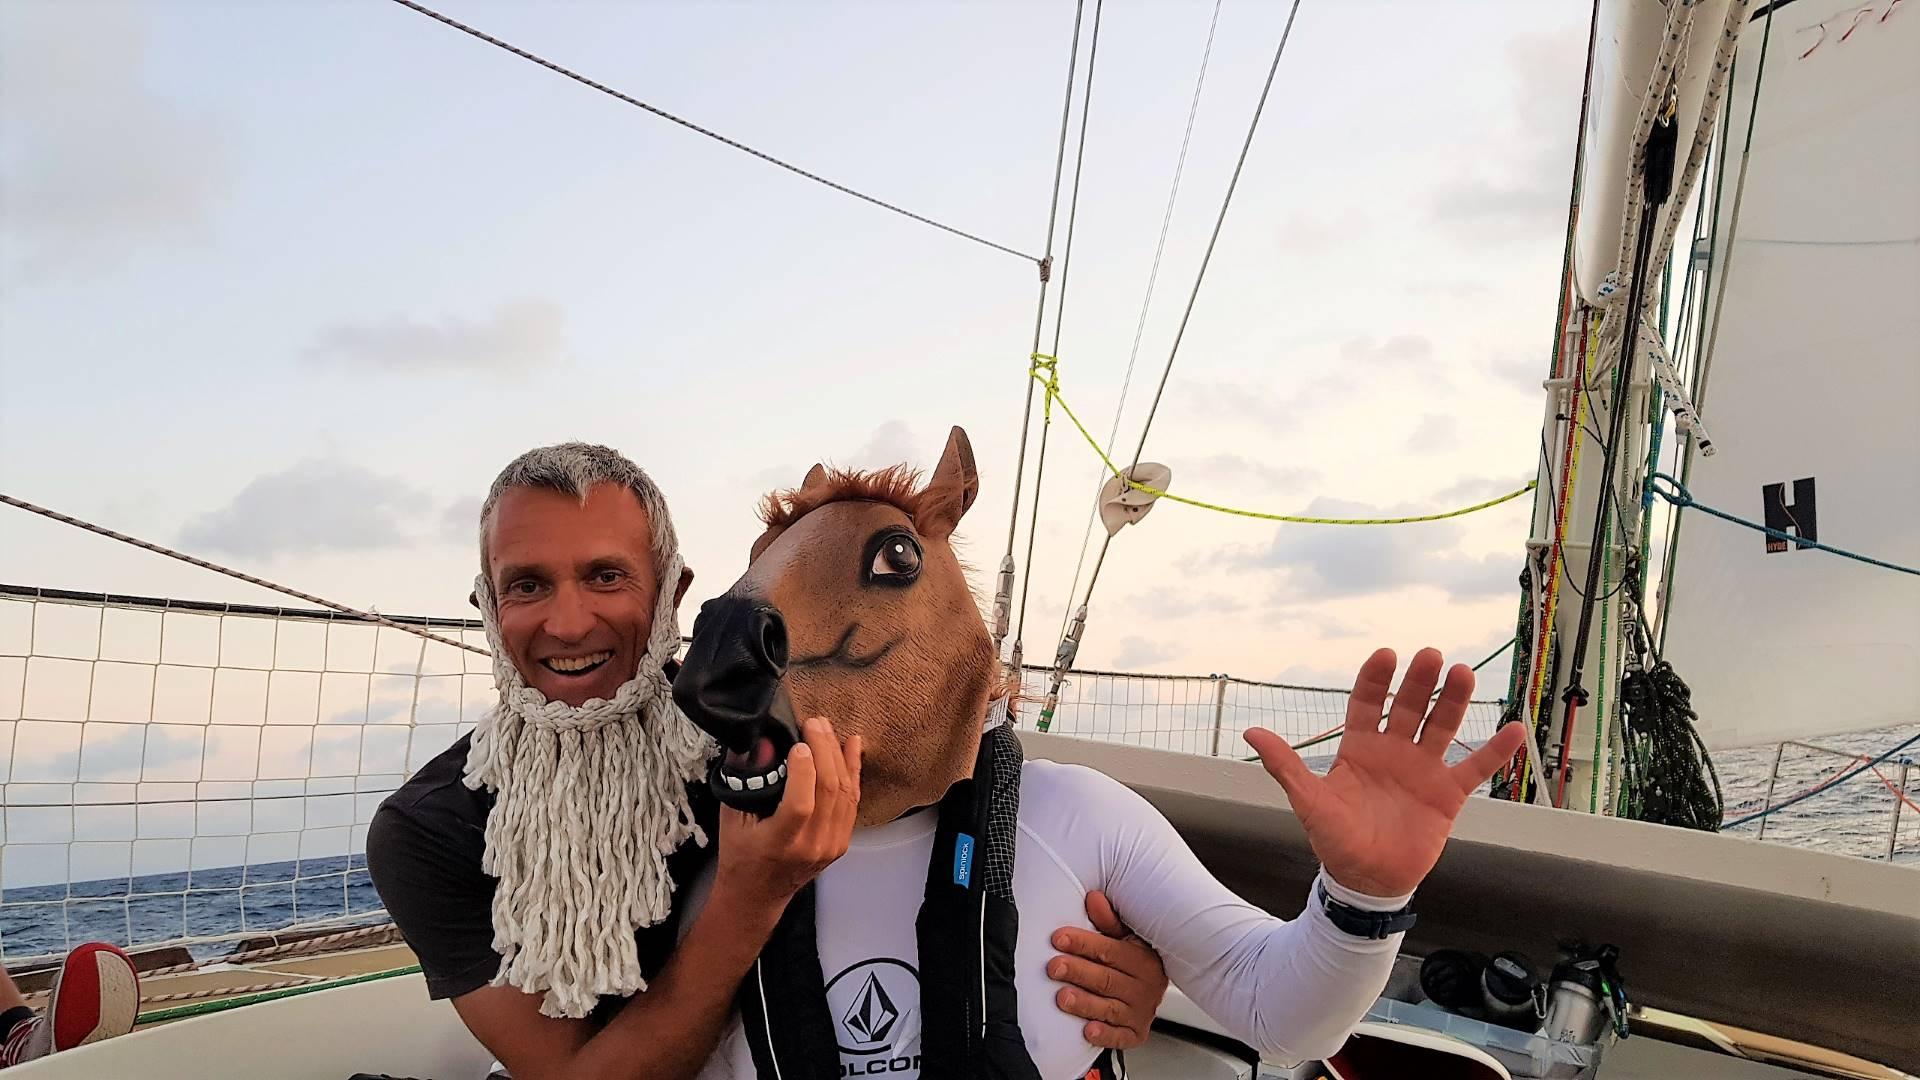 Race_2_Leg_1_CV27_DTL_King_Neptun_and_the_horse_latitudes